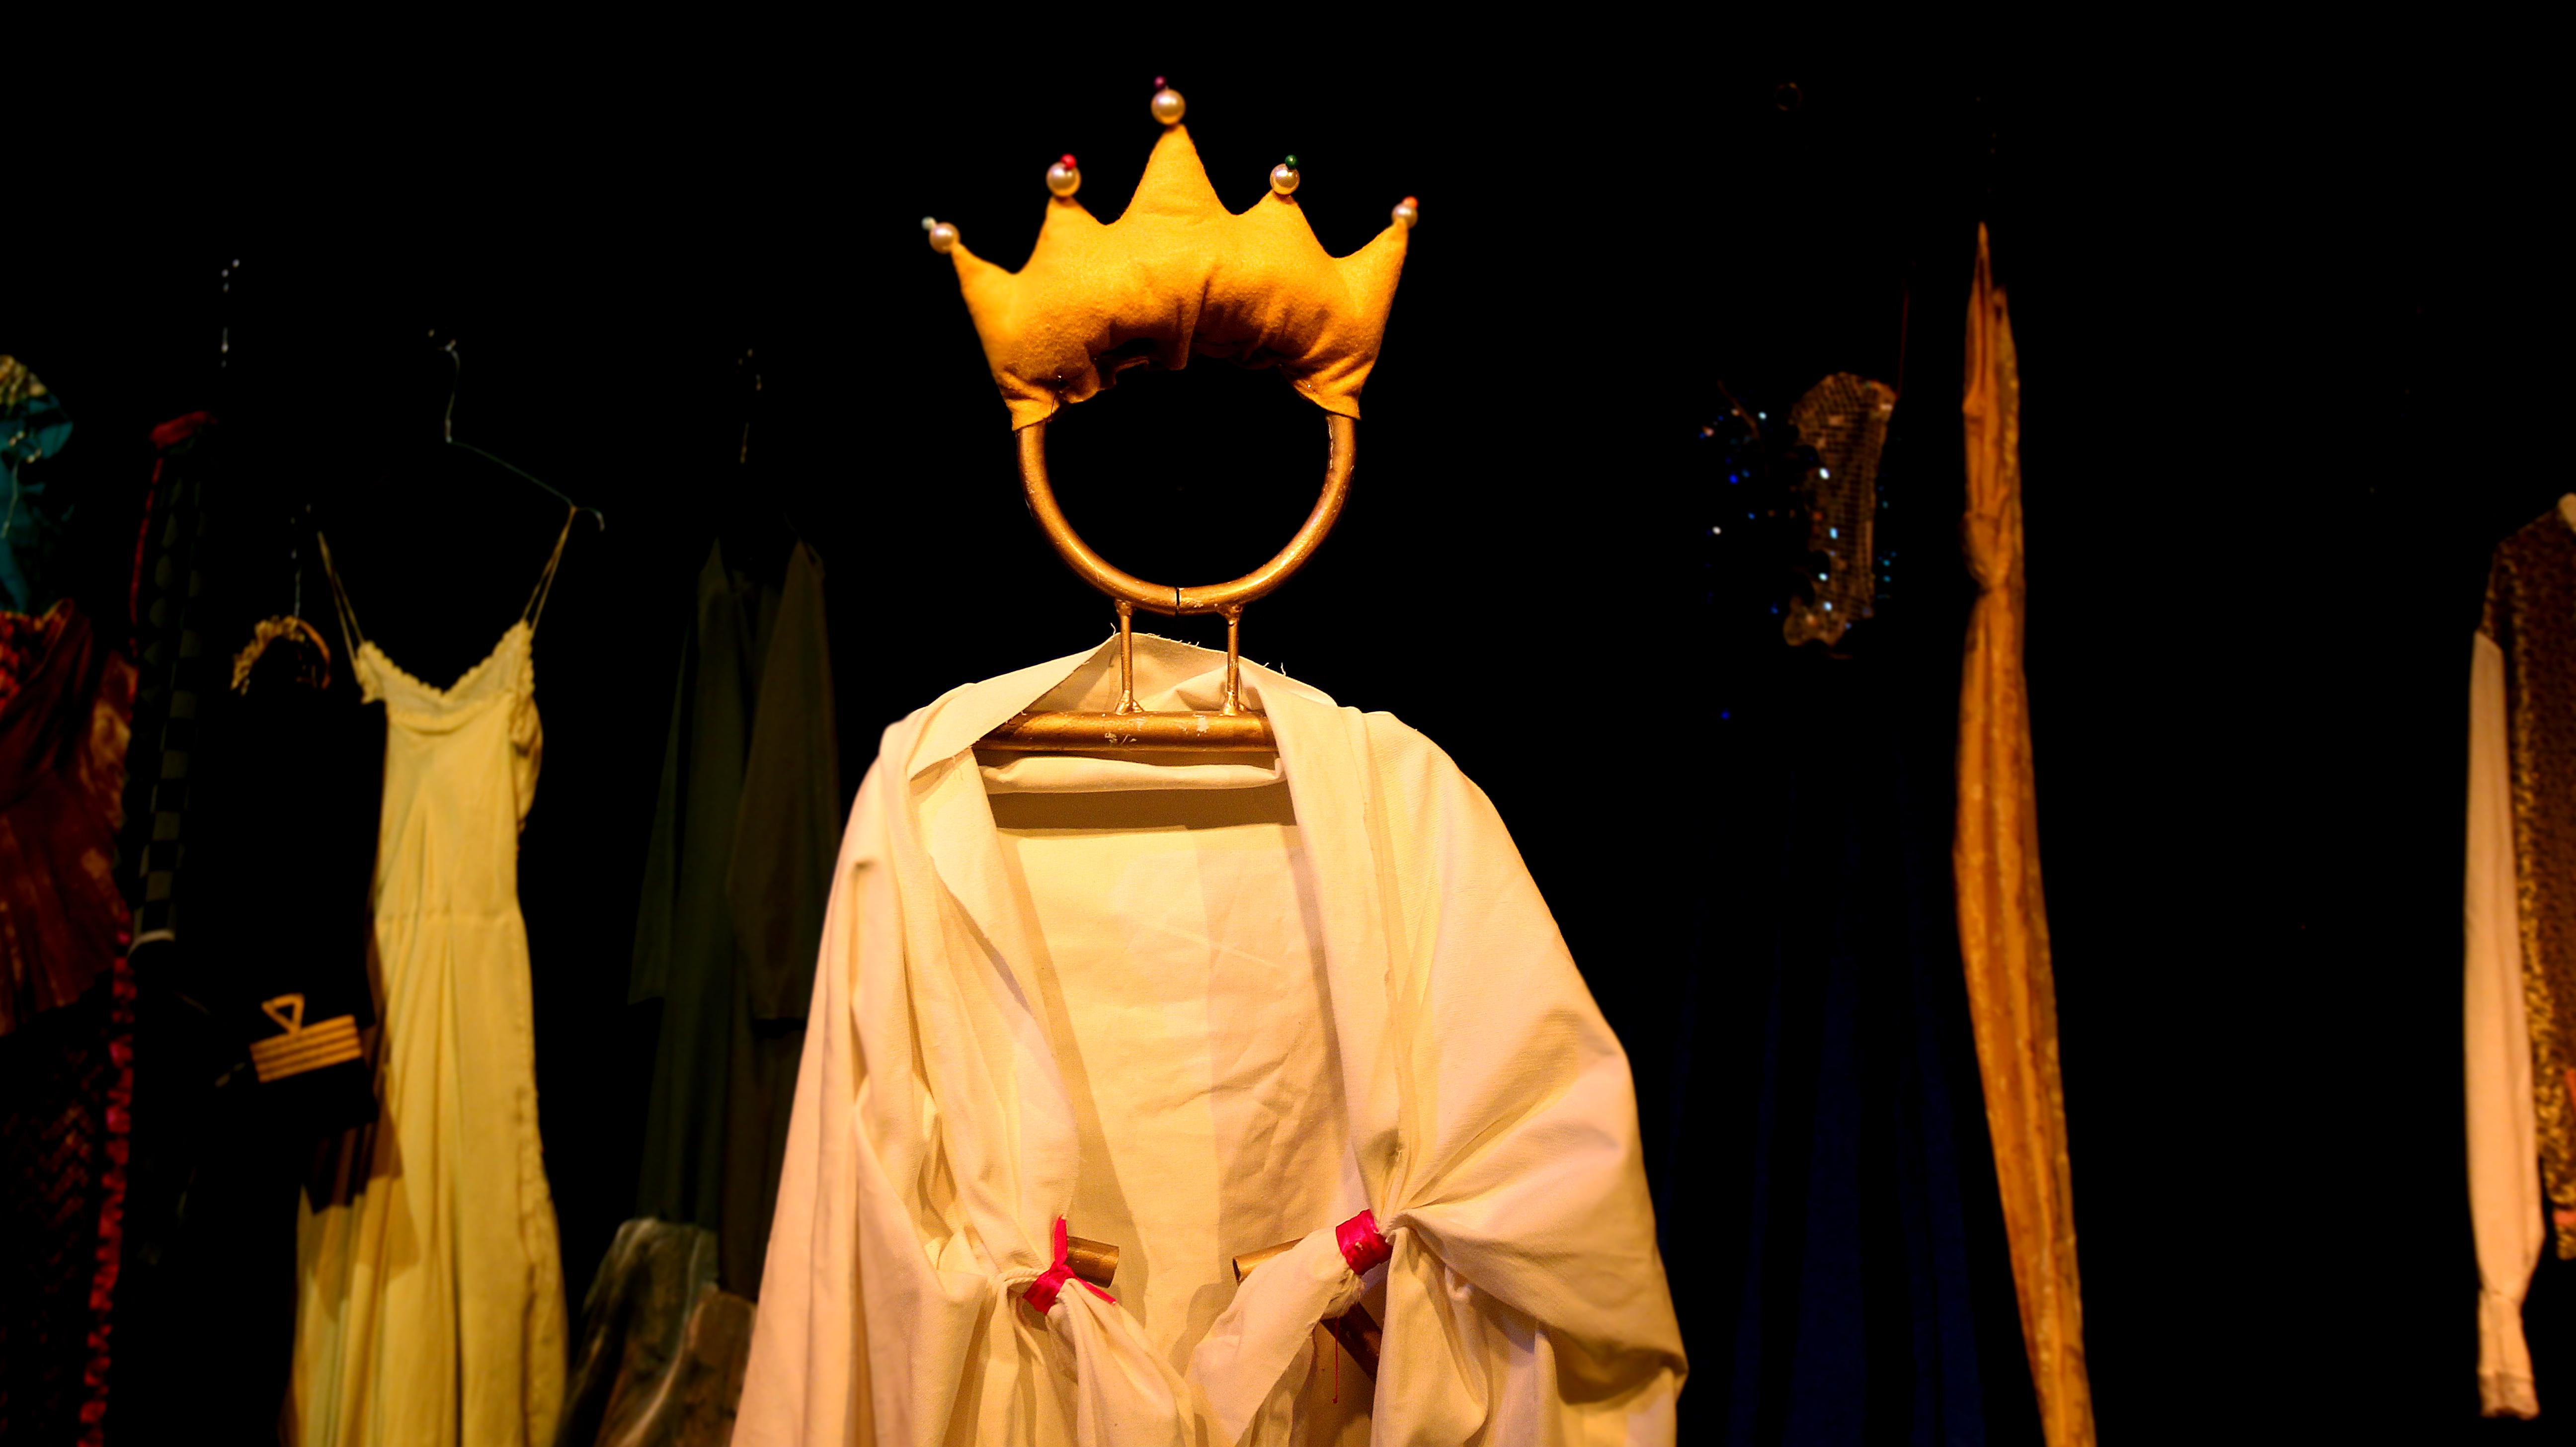 3676bfbf63a Τα Καινούρια Ρούχα του Αυτοκράτορα στο Θέατρο Βαφείο.